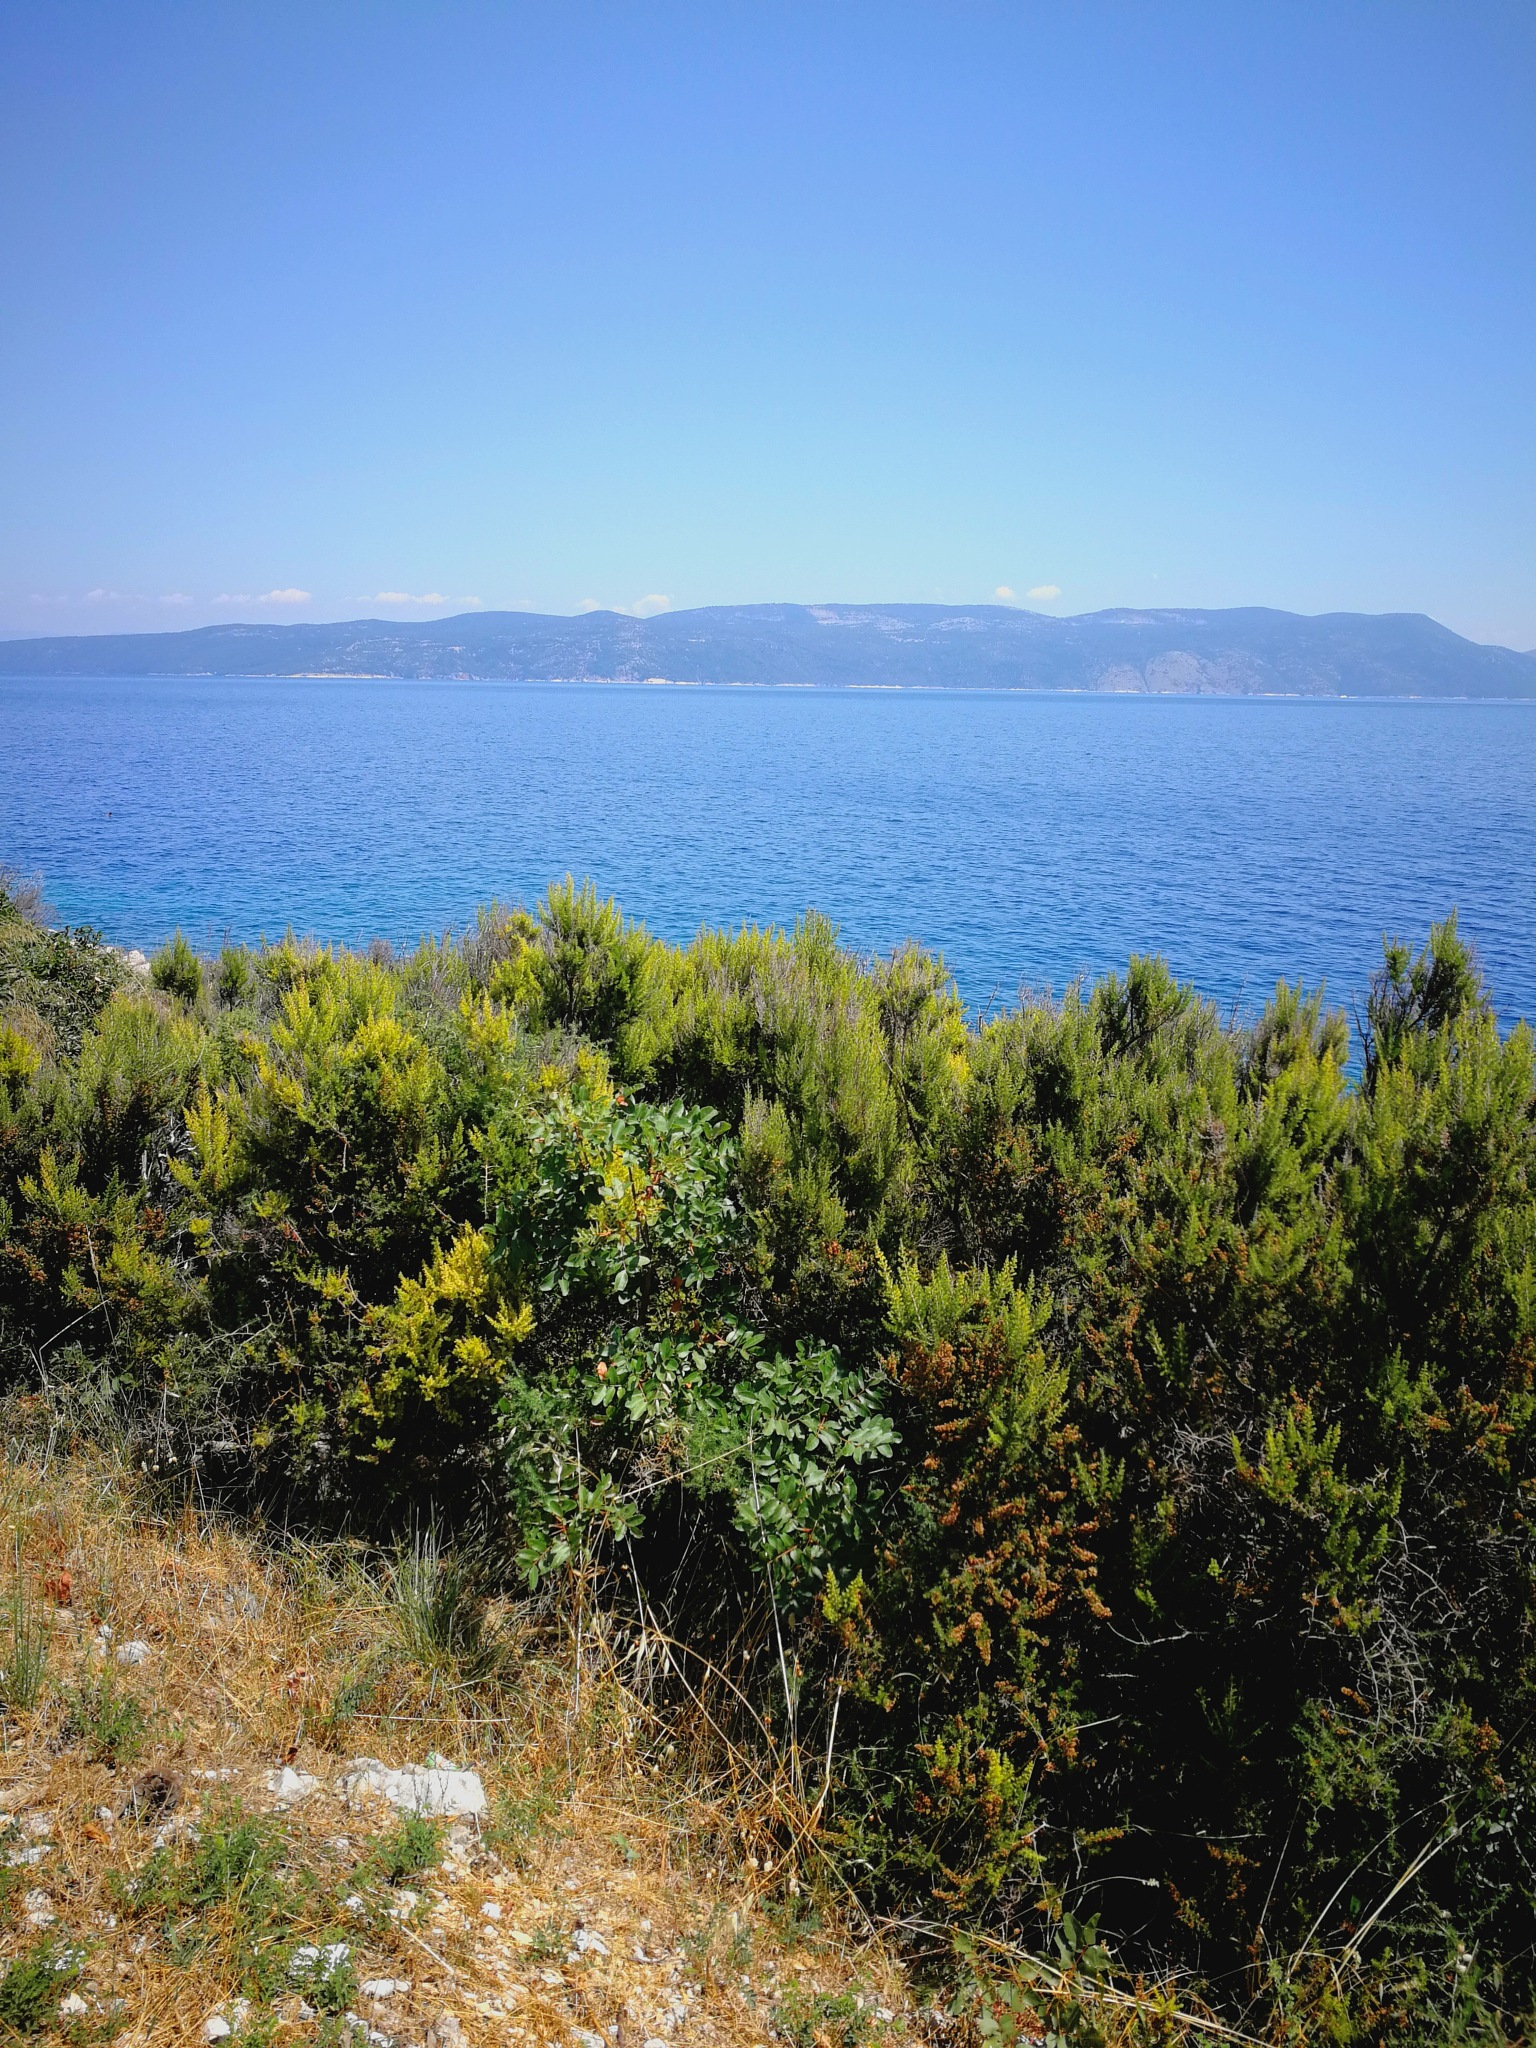 Croatia - Exploring The Woods by Kristin Carlsson